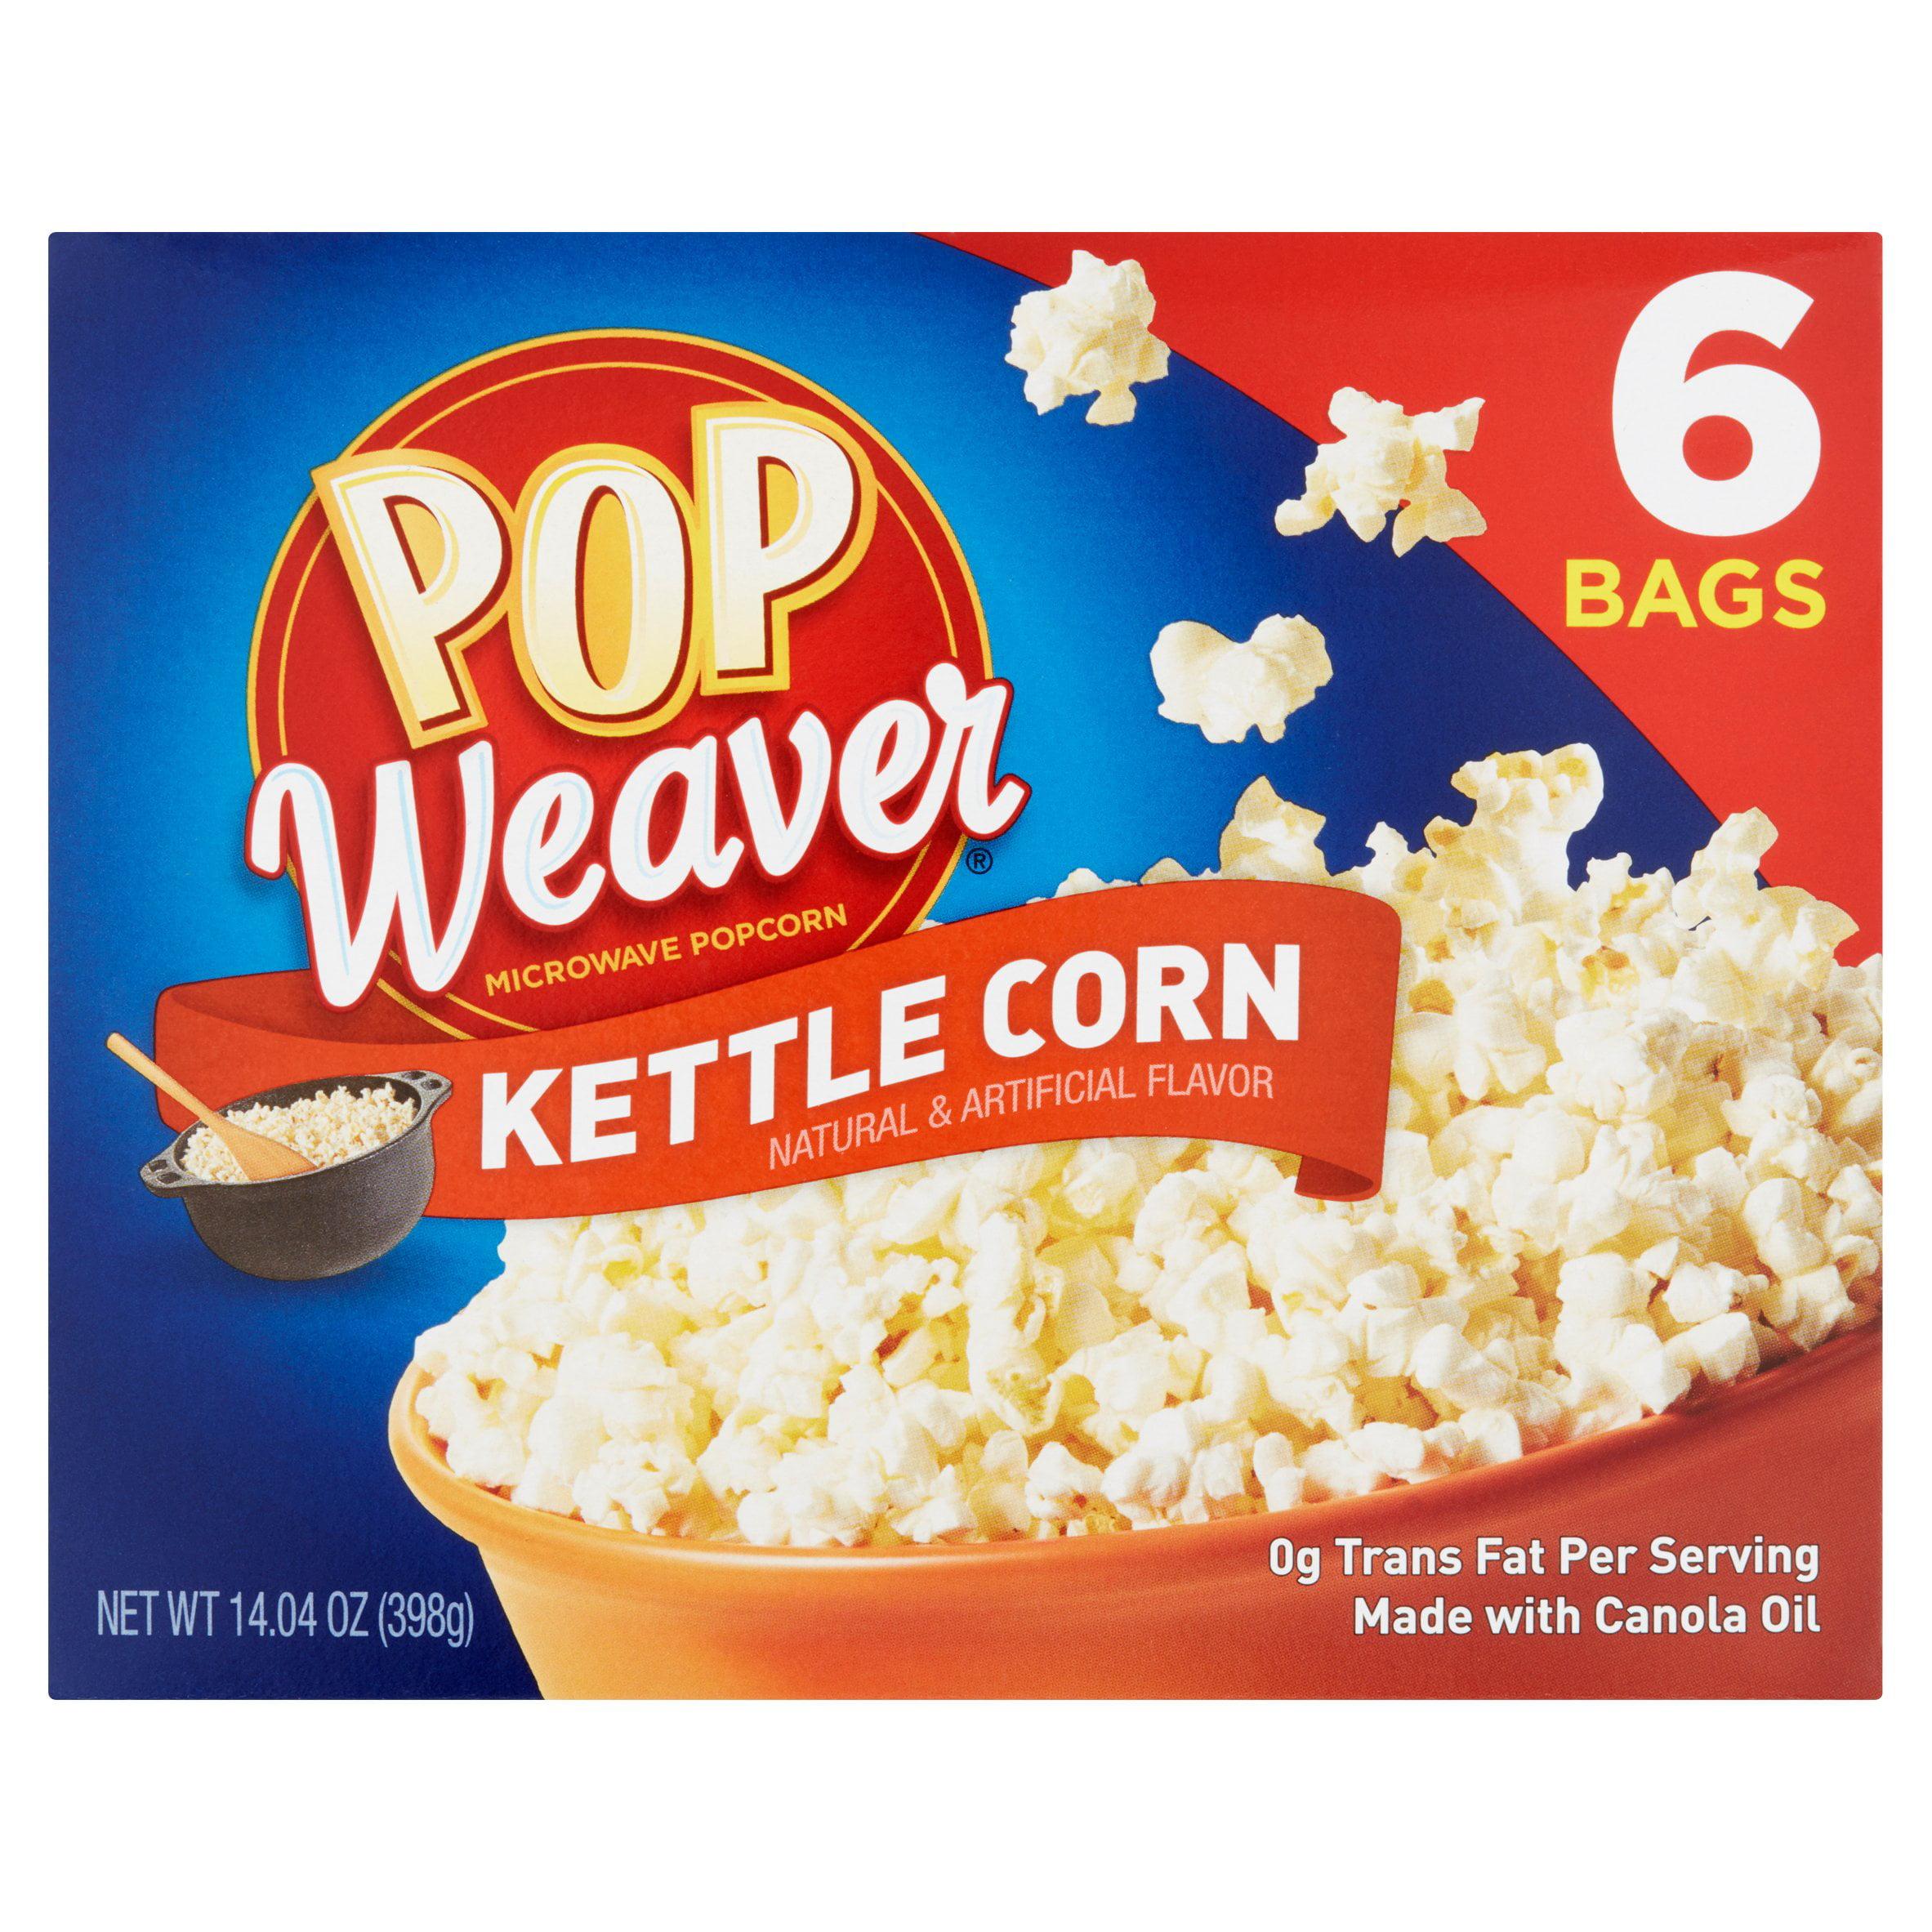 Pop Weaver Kettle Corn Microwave Popcorn 6 Count 14 04 Oz